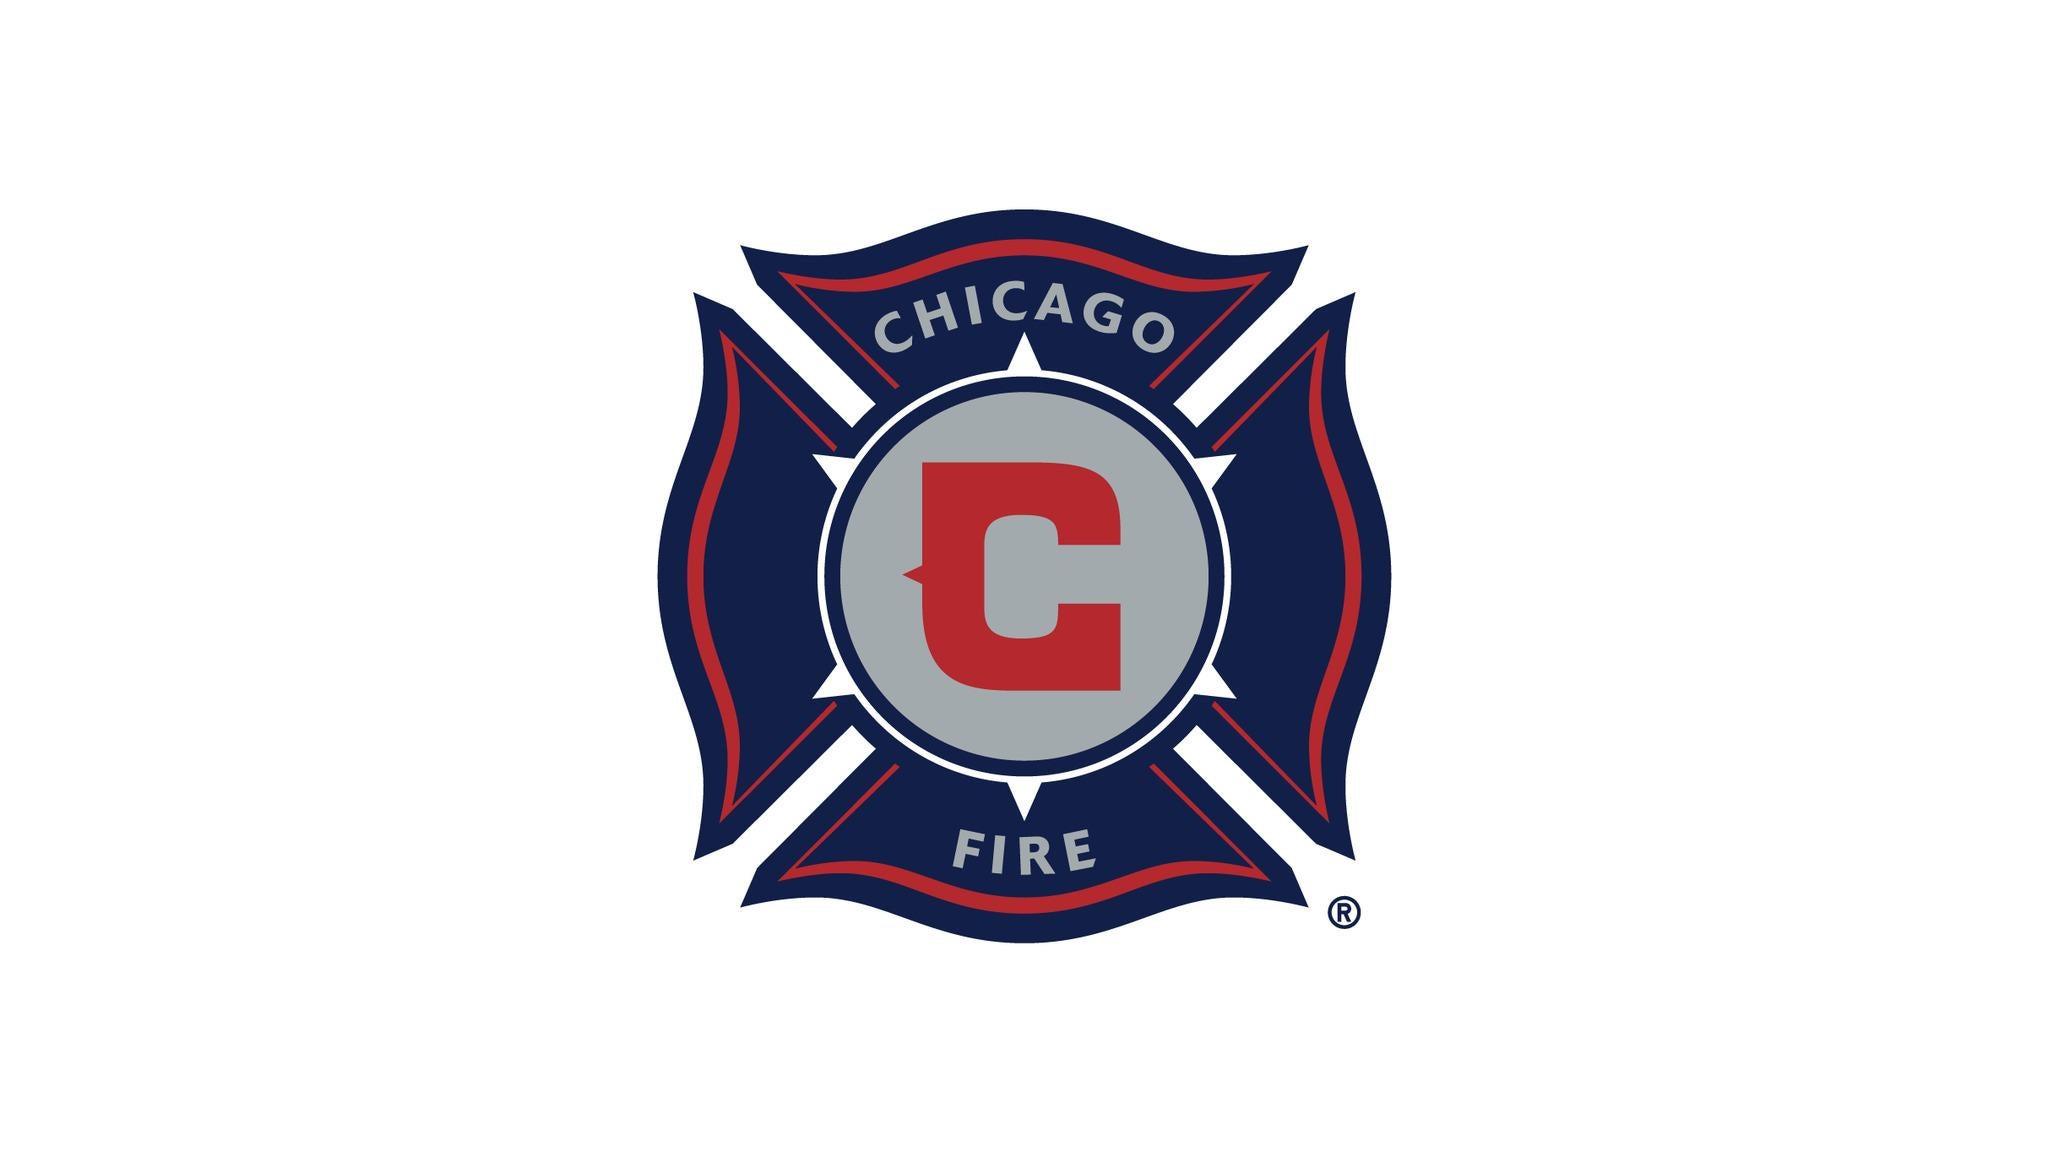 Chicago Fire vs. Atlanta United FC at TOYOTA PARK